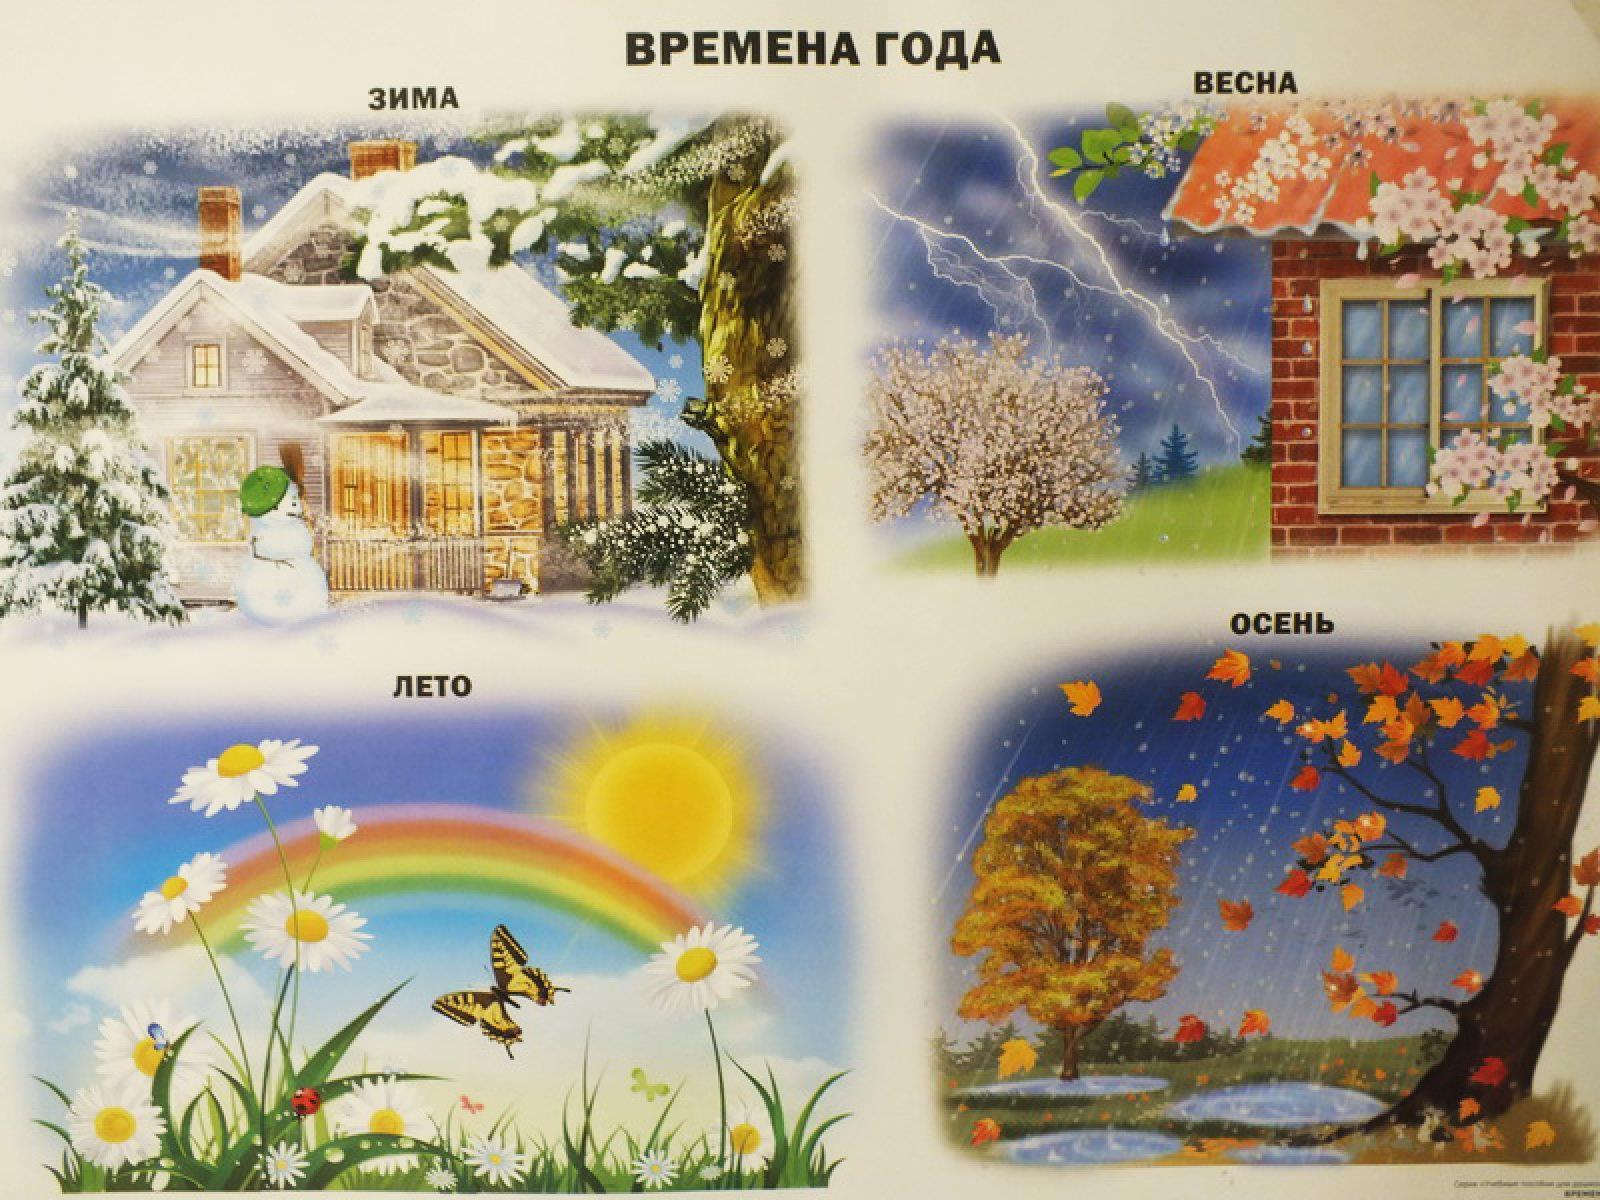 Картинки с надписями осень зима весна лето, хенд мейд